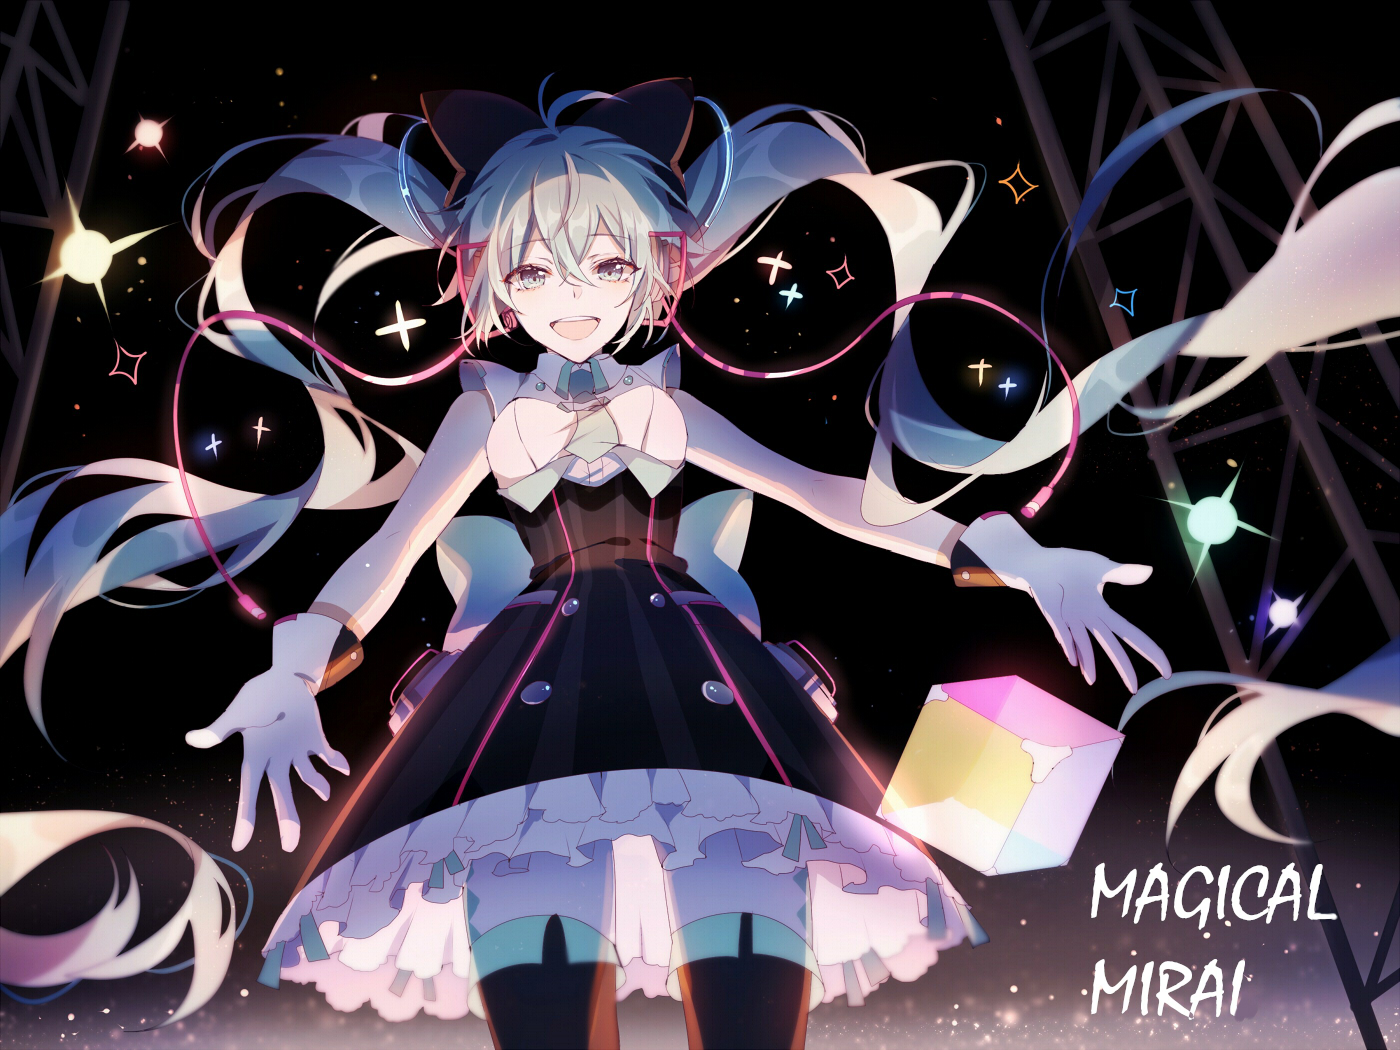 dress gloves hatsune_miku headphones lococo:p long_hair magical_mirai_(vocaloid) thighhighs twintails vocaloid